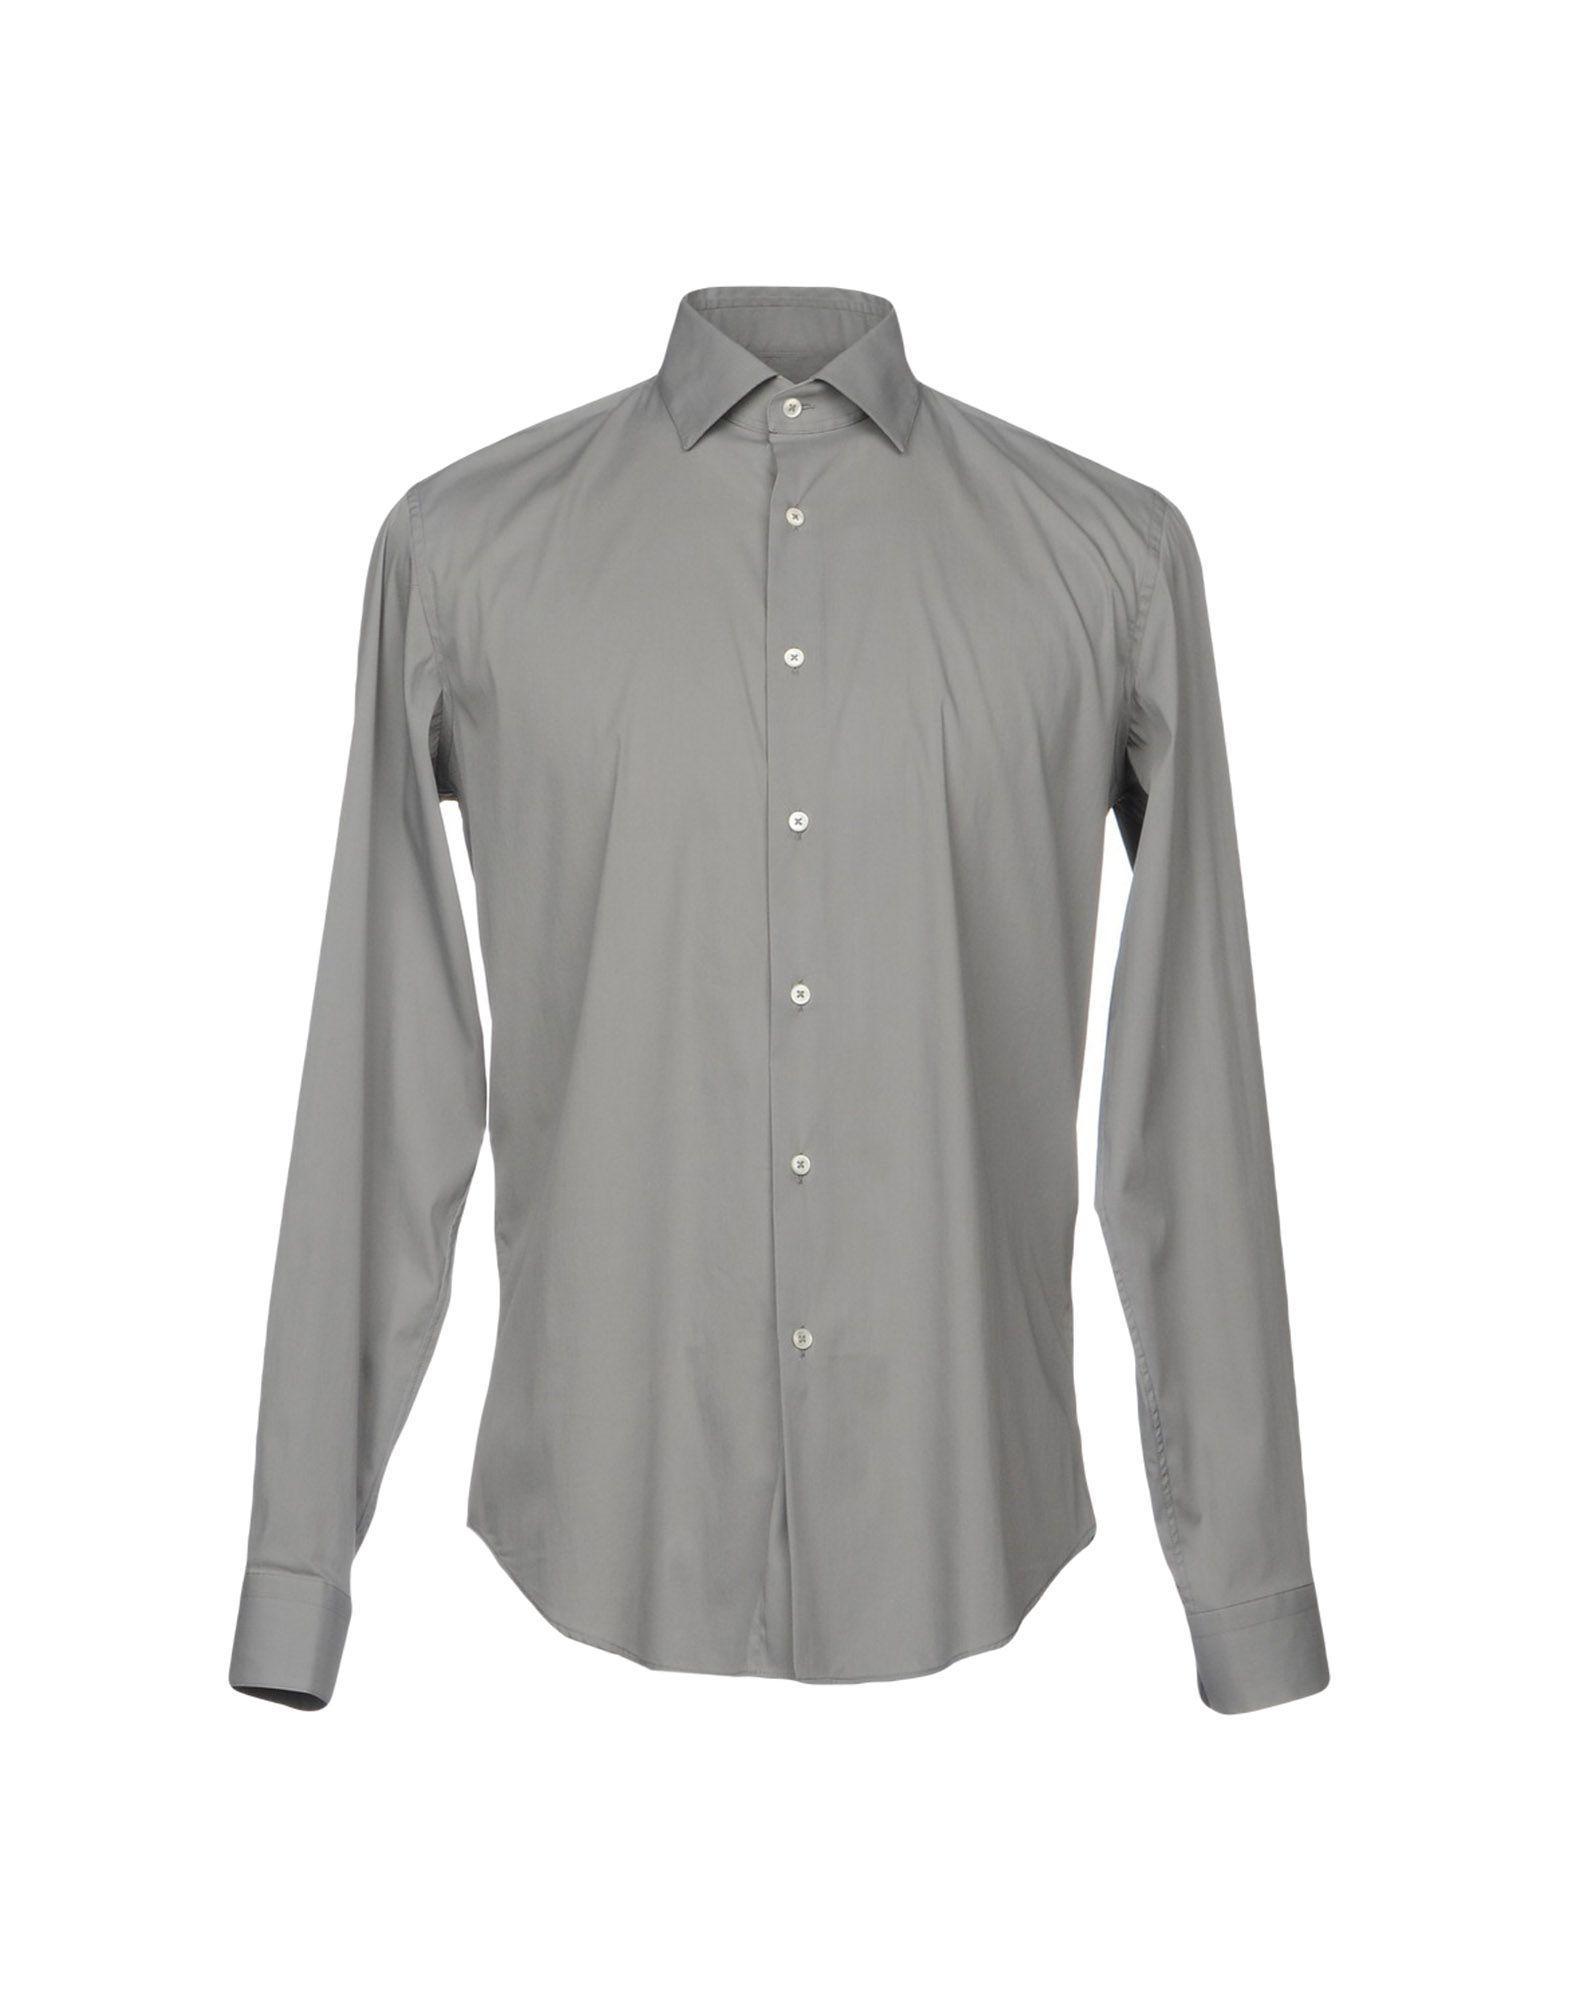 Robert Friedman Solid Color Shirt In Grey